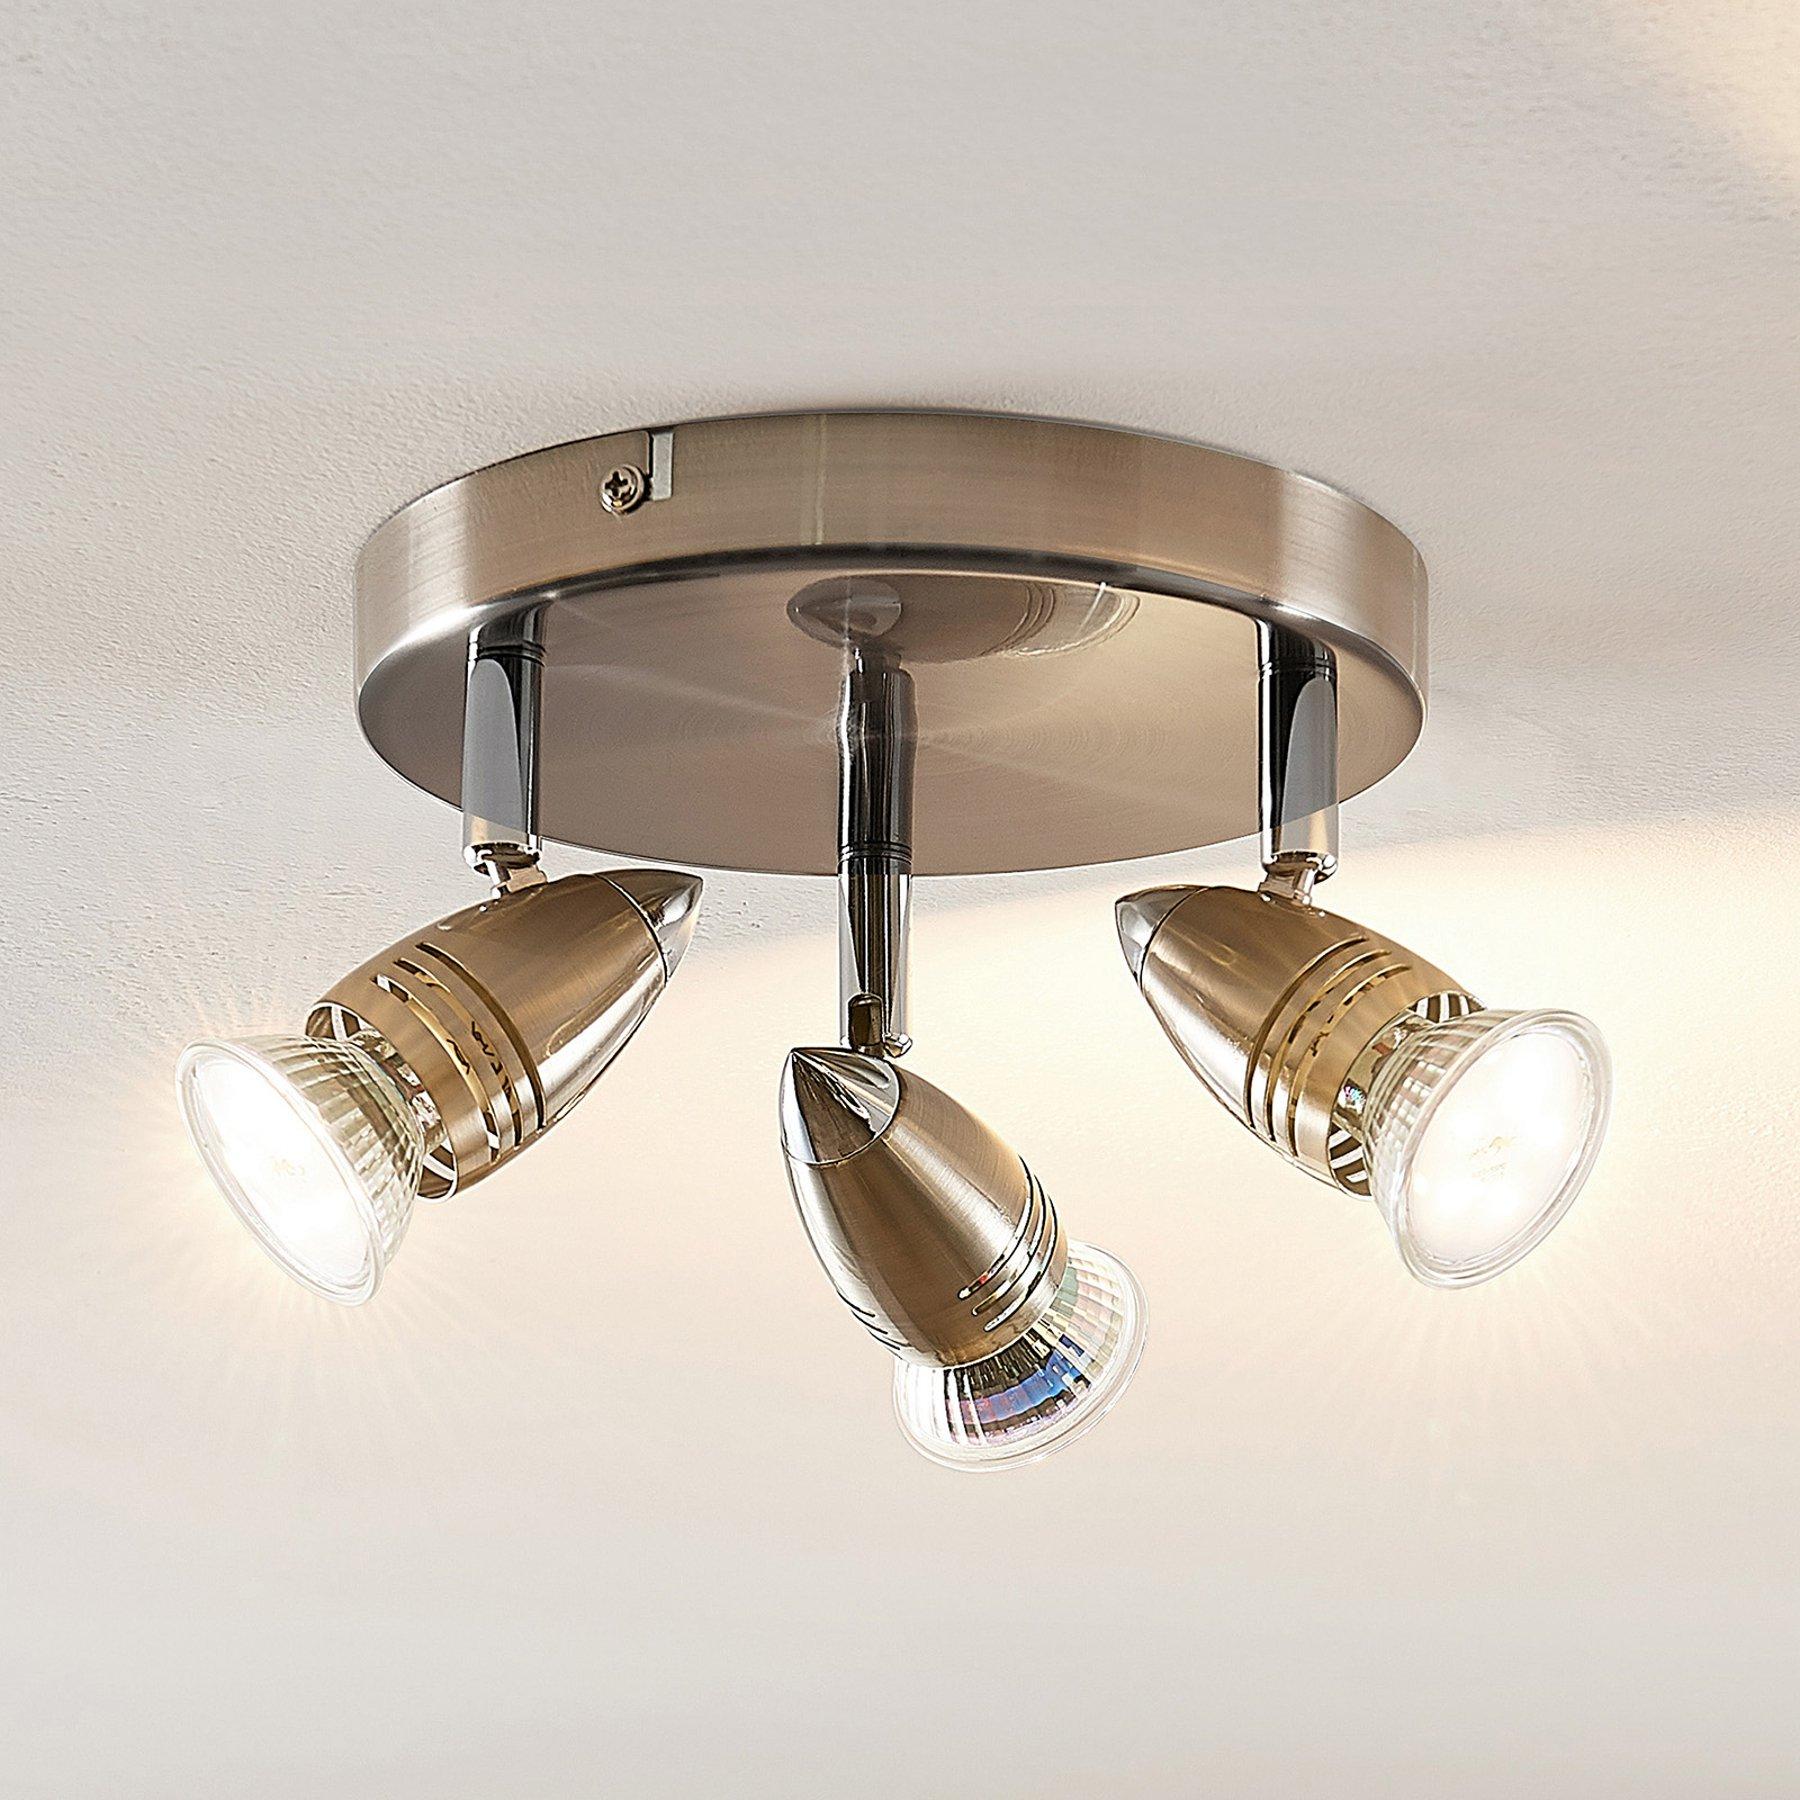 ELC Kalean LED-takspot, nikkel, 3 lyskilder